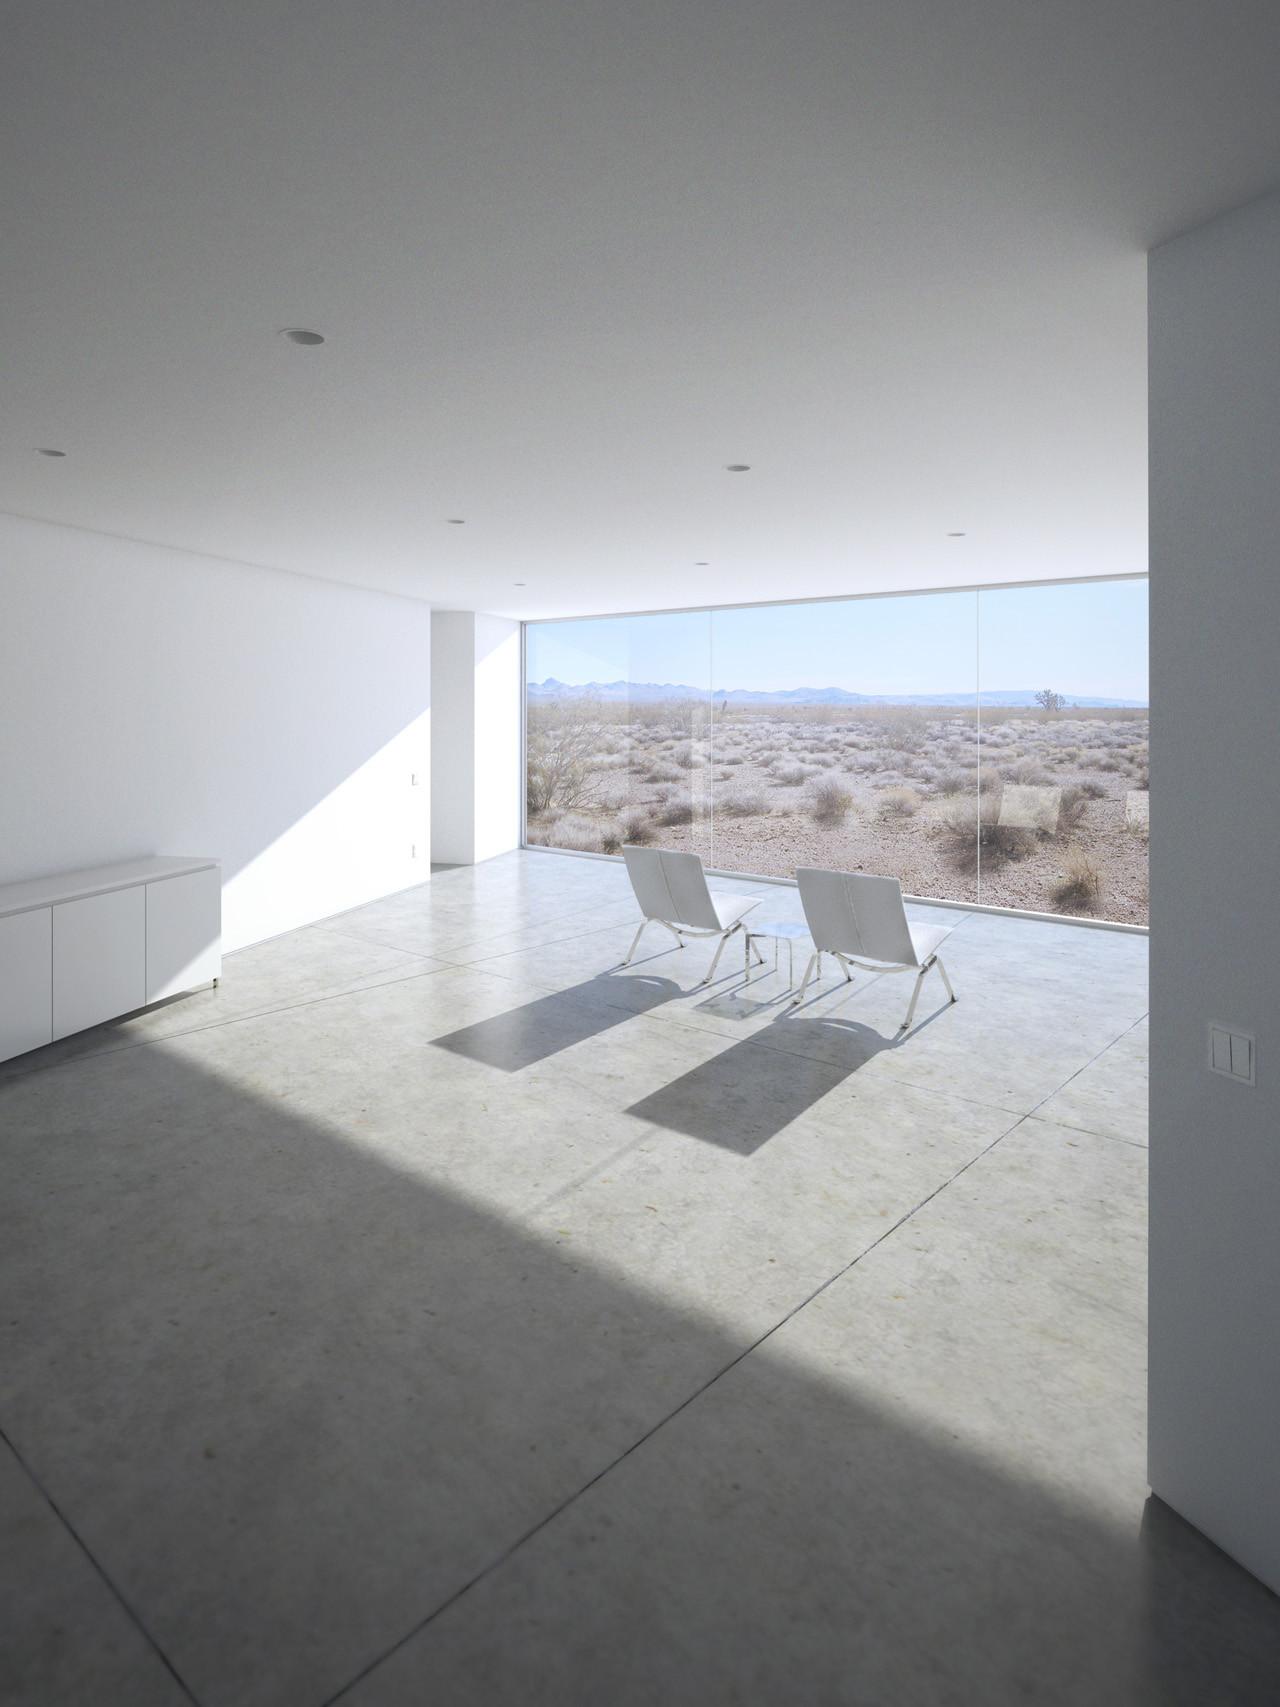 Casa Cuatro Ojos / Edward Ogosta Architecture